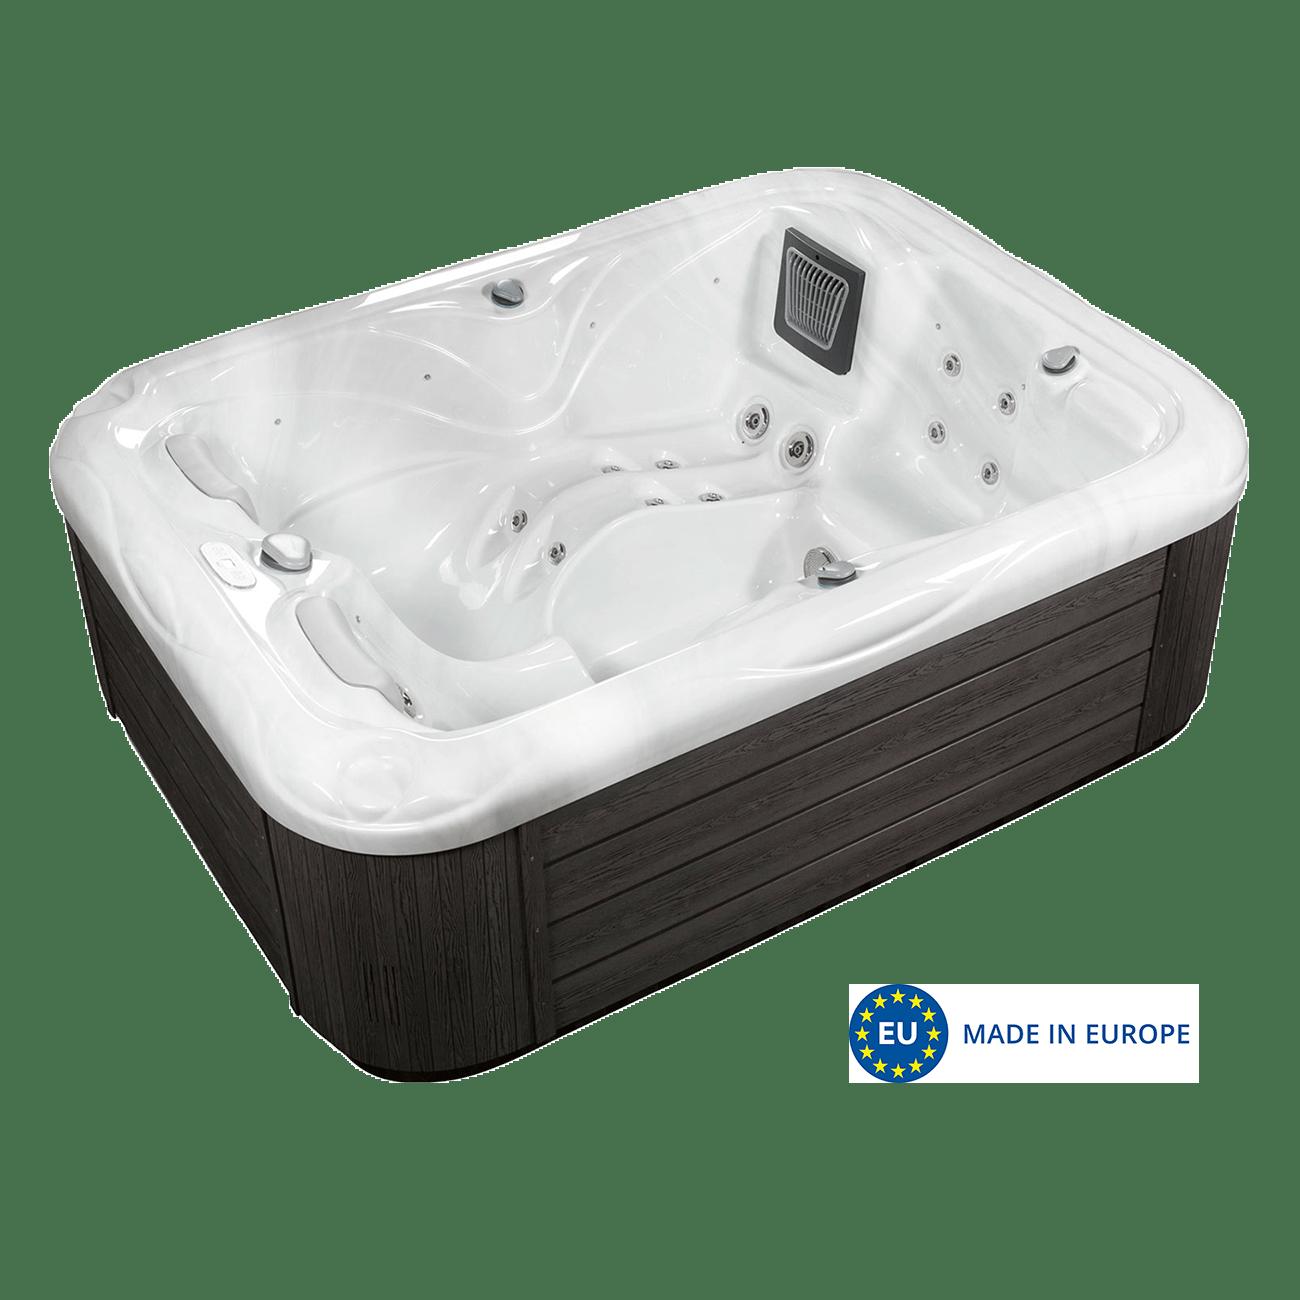 Top-Angebot: Whirlpool FlexLine Maui